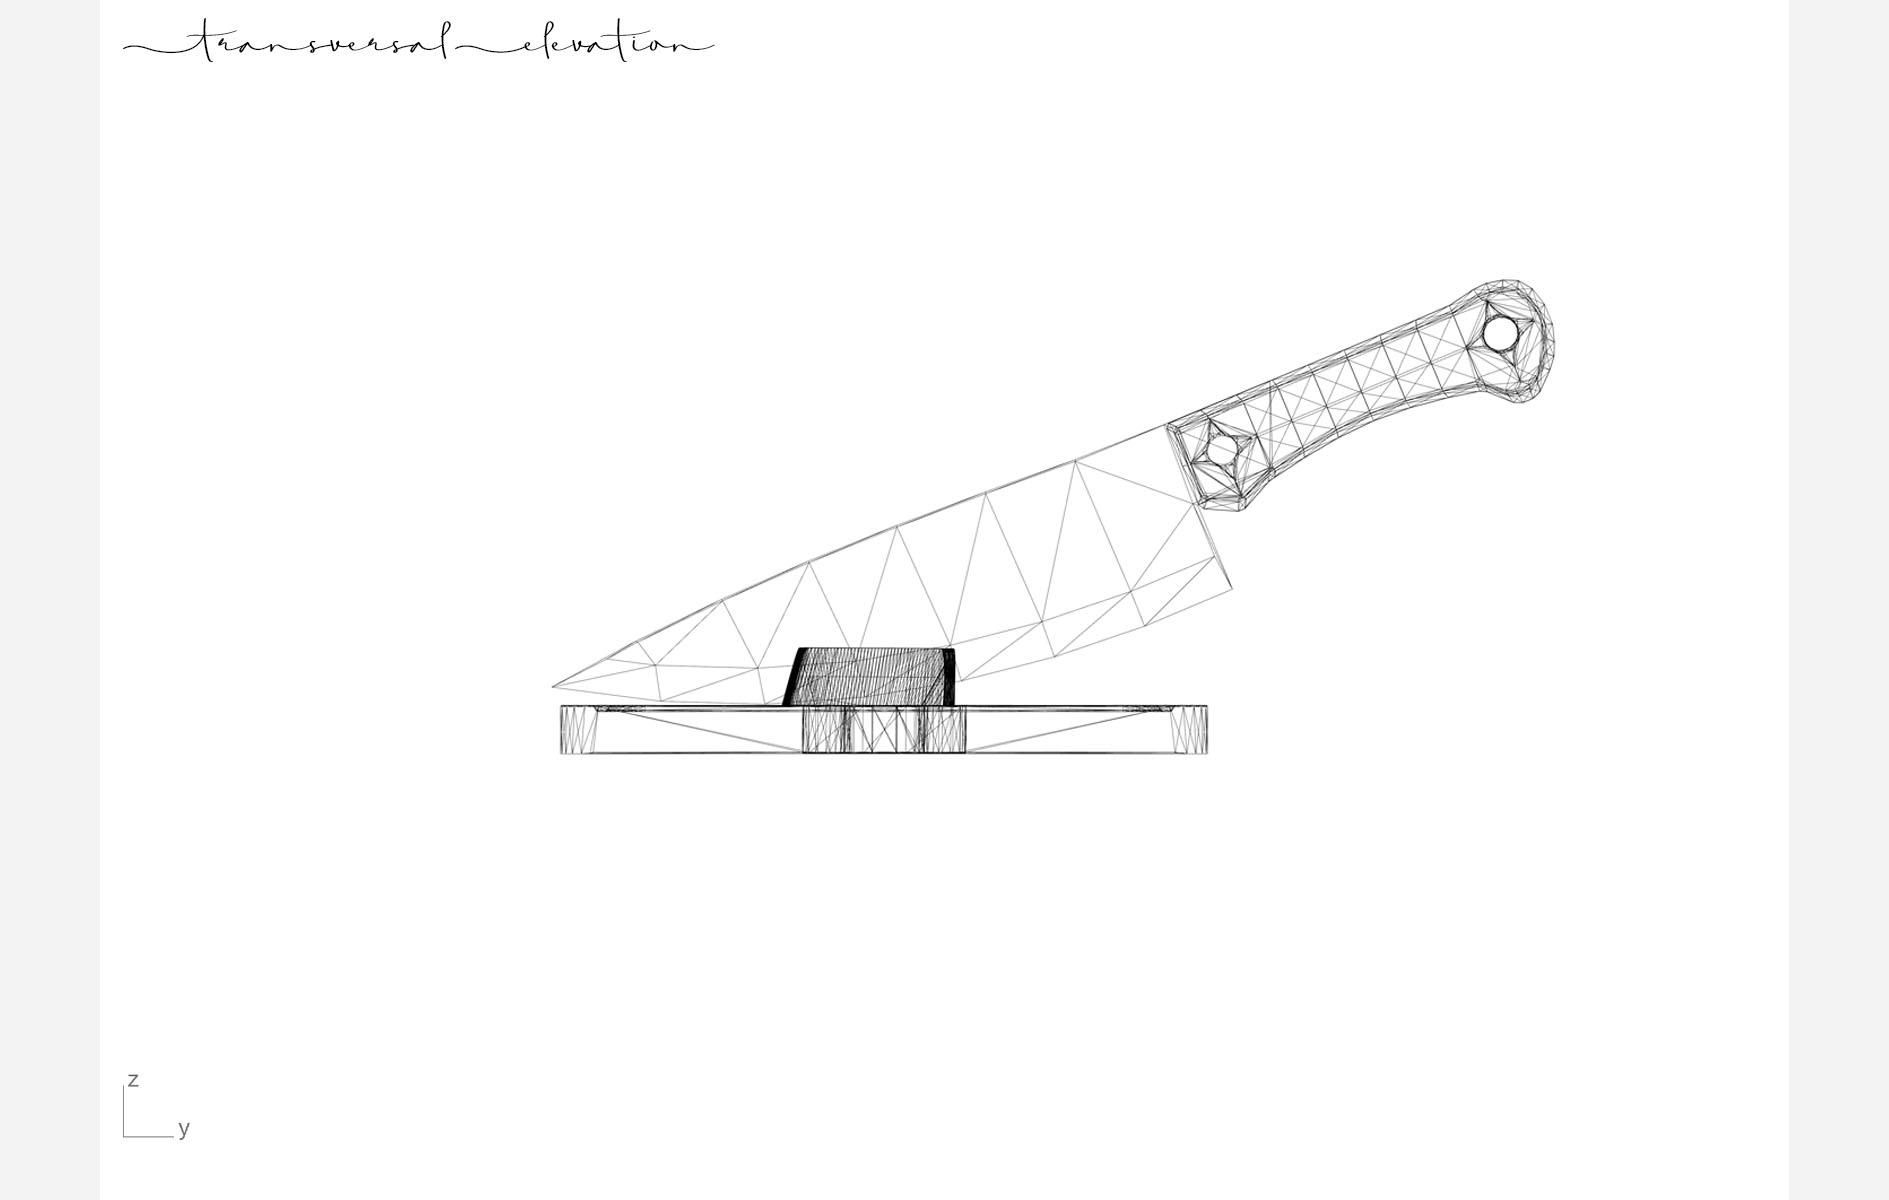 4 transversal elevation